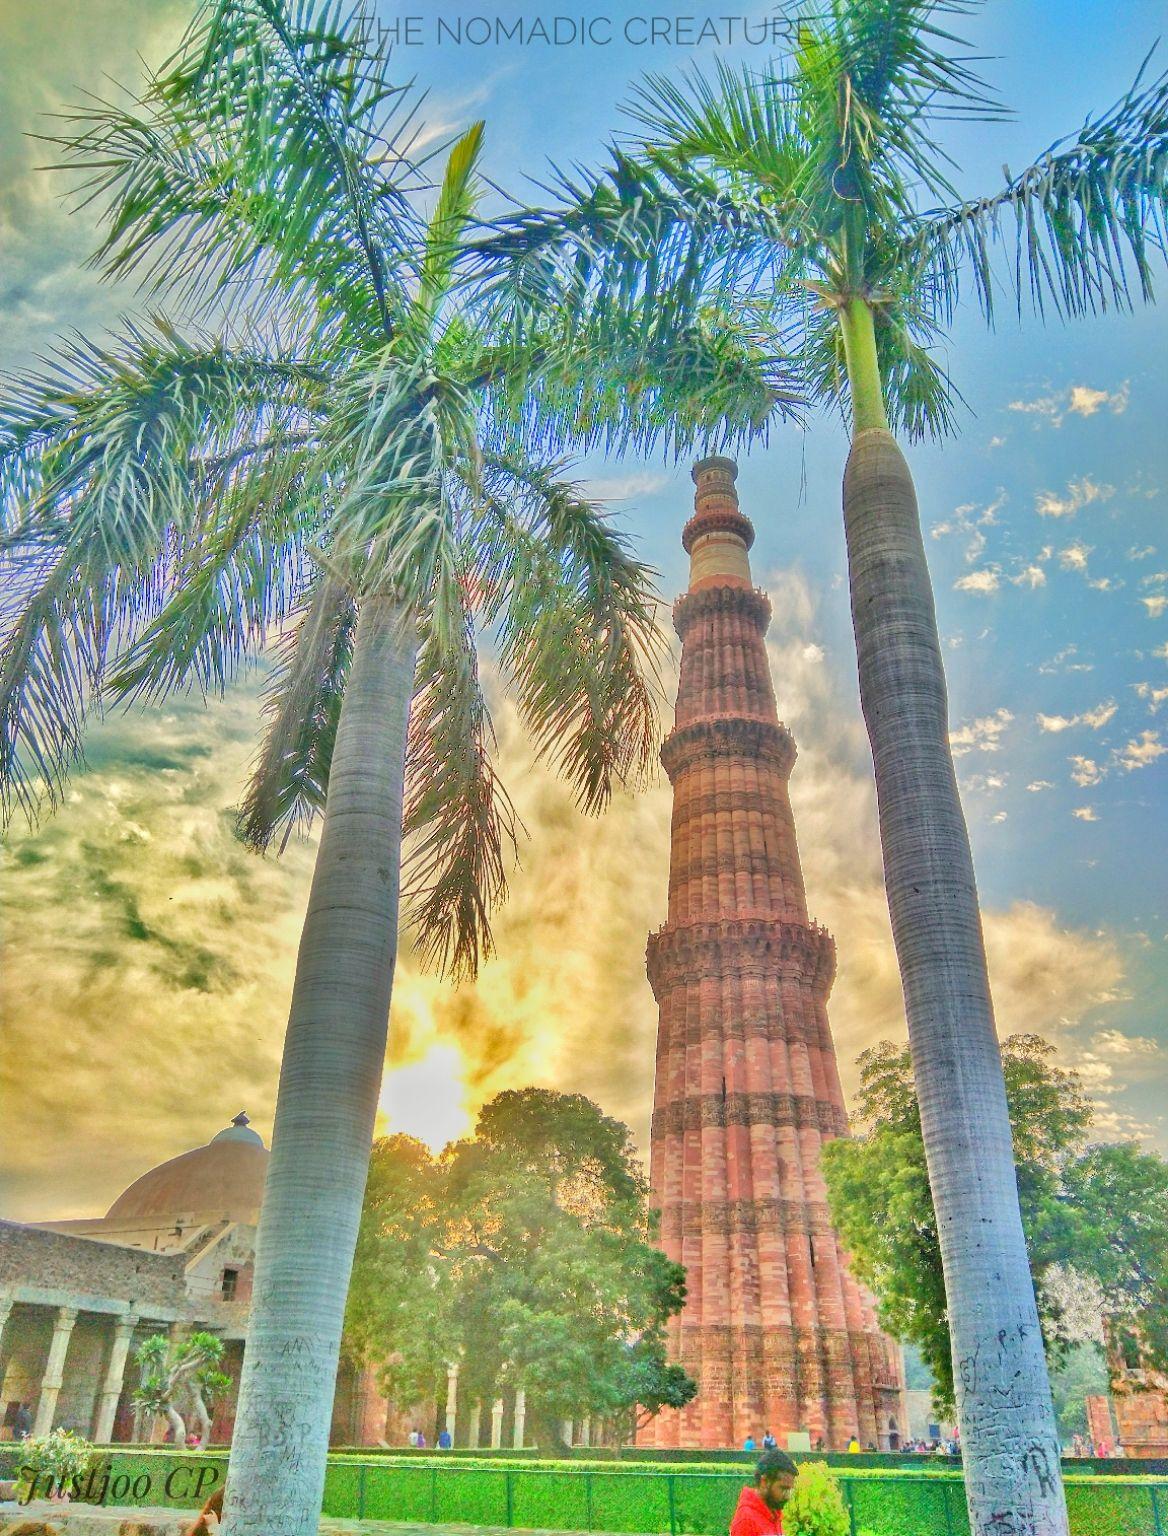 Photo of Qutub Minar By Justjoo CP